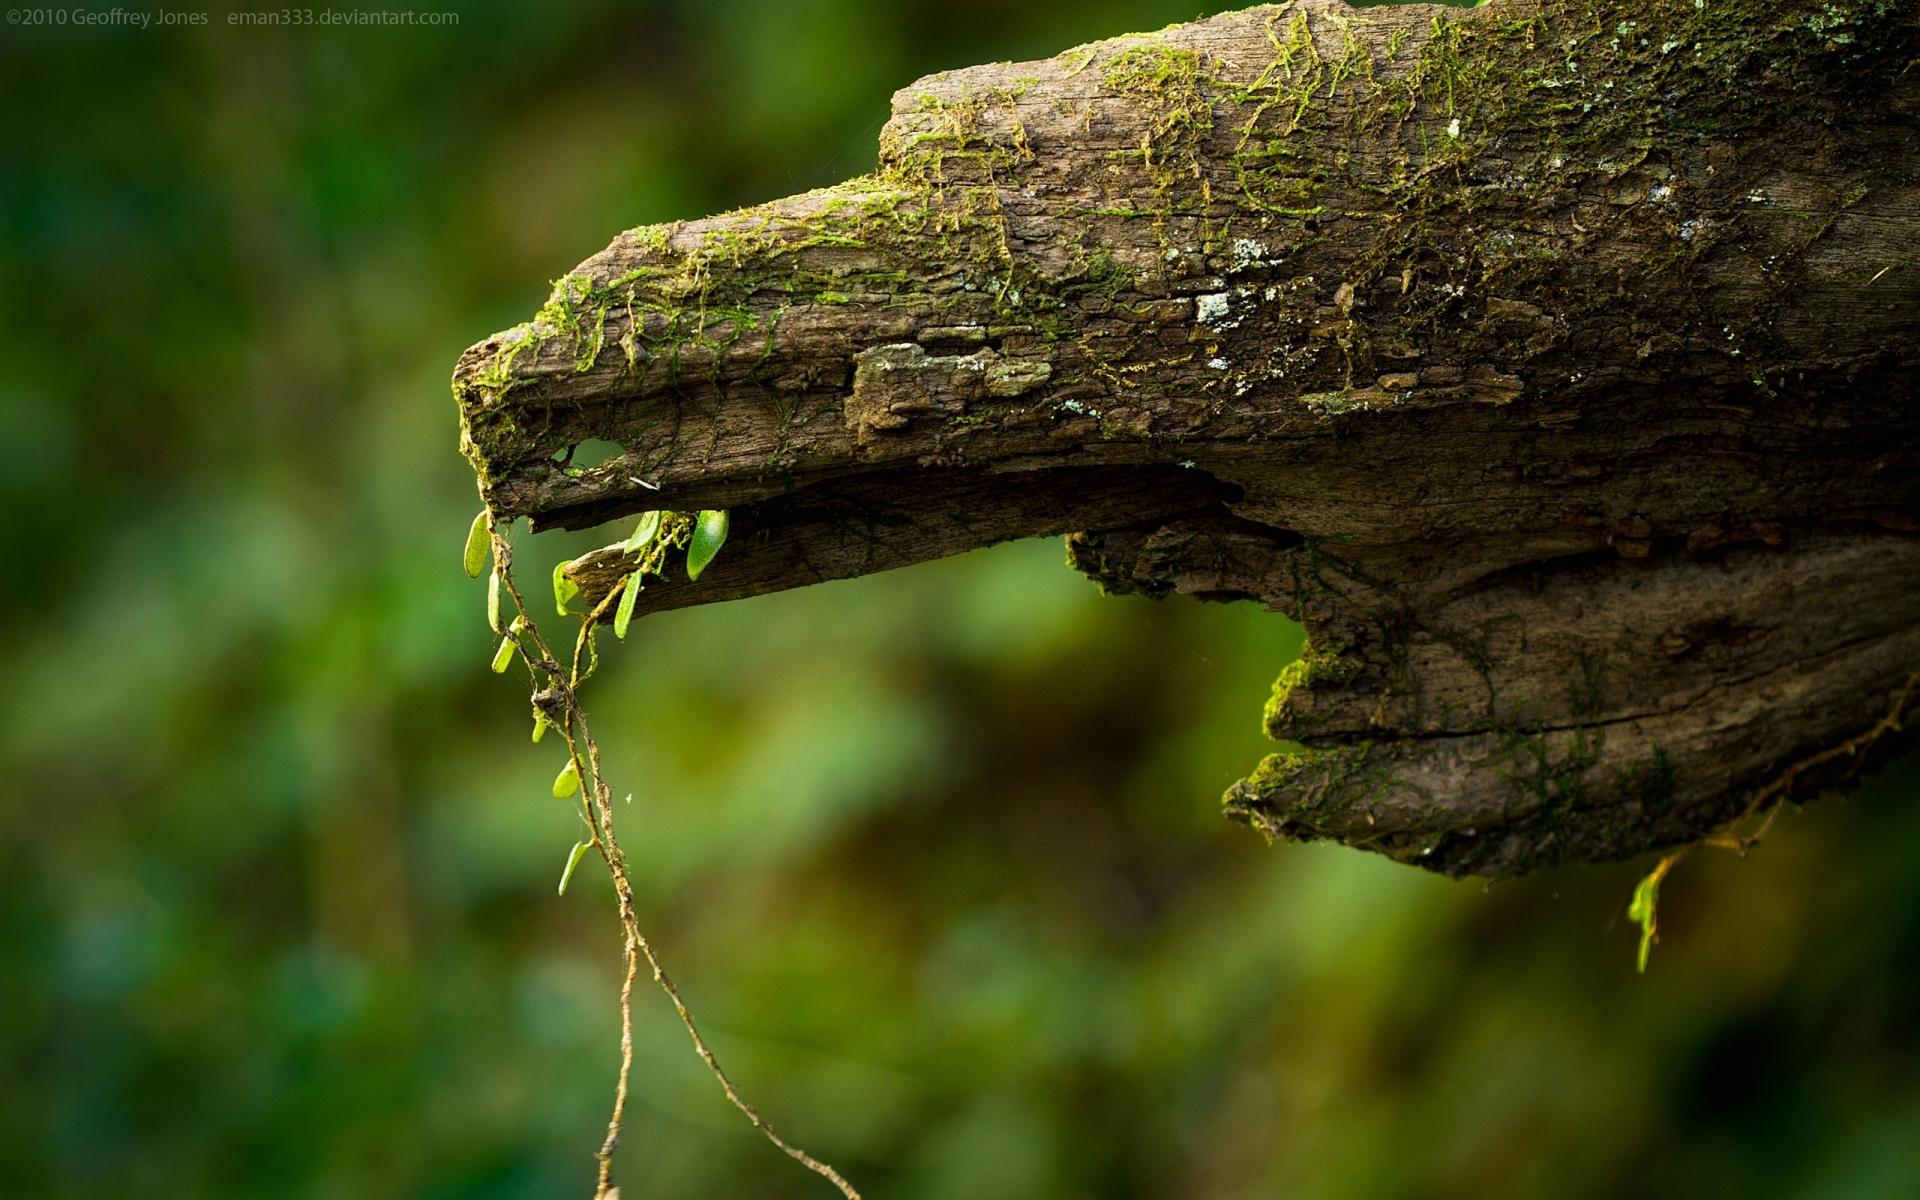 Картинки Макро, зеленый, лес, мох фото и обои на рабочий стол